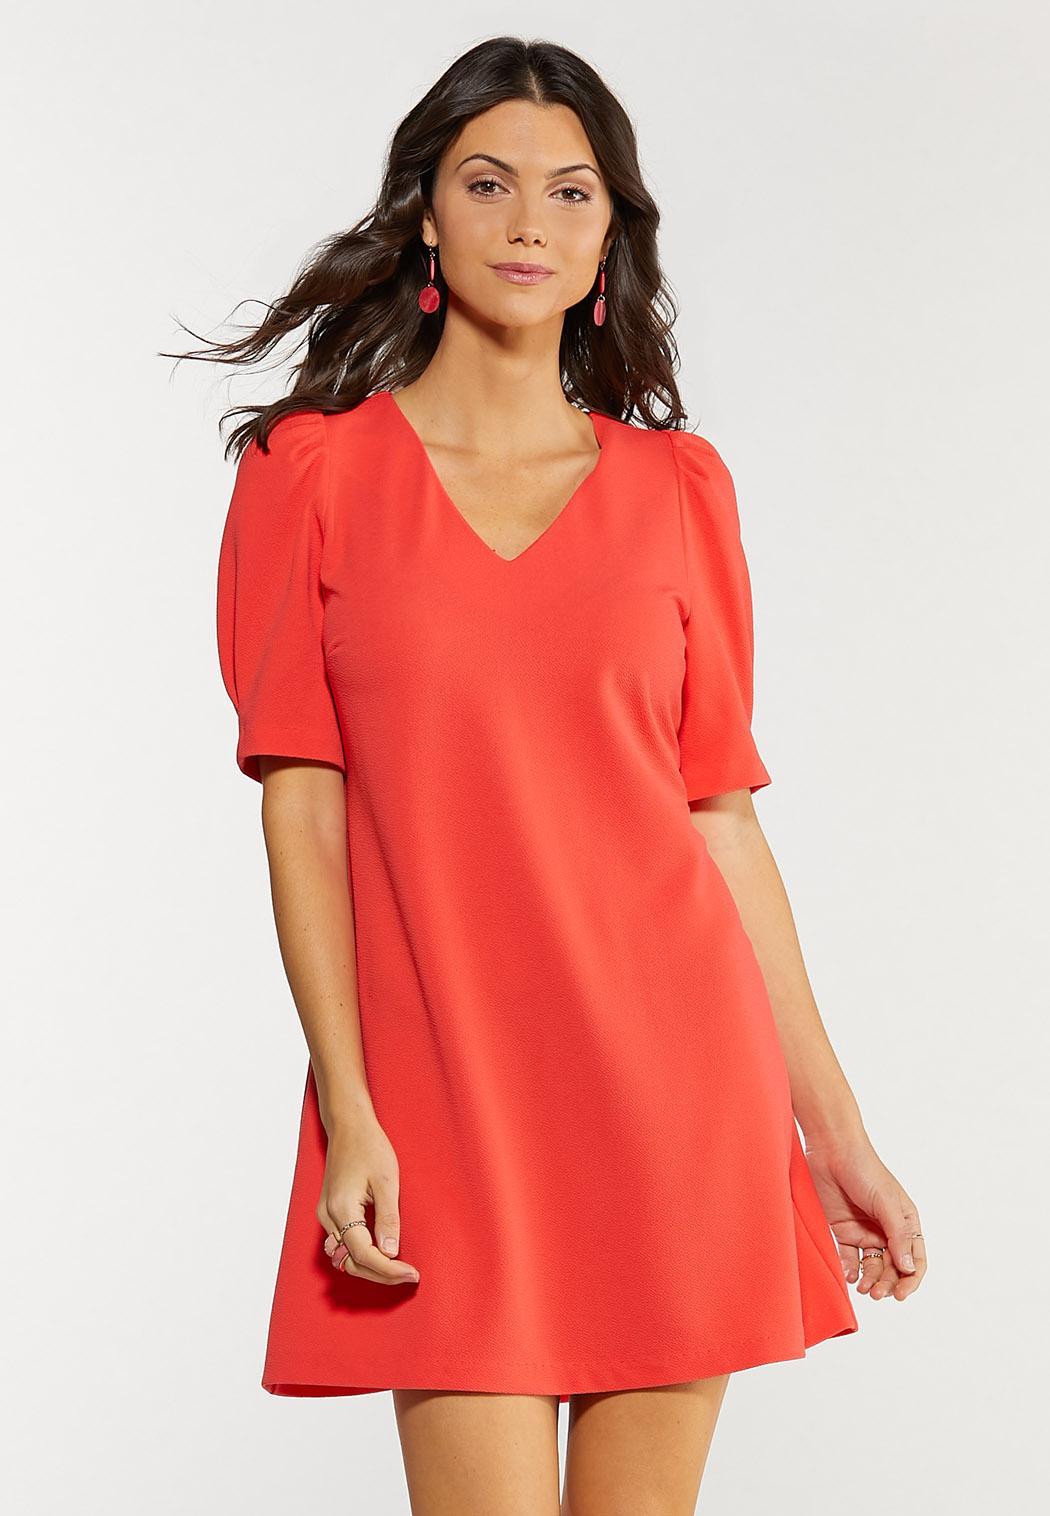 Plus Size Spice Coral Swing Dress